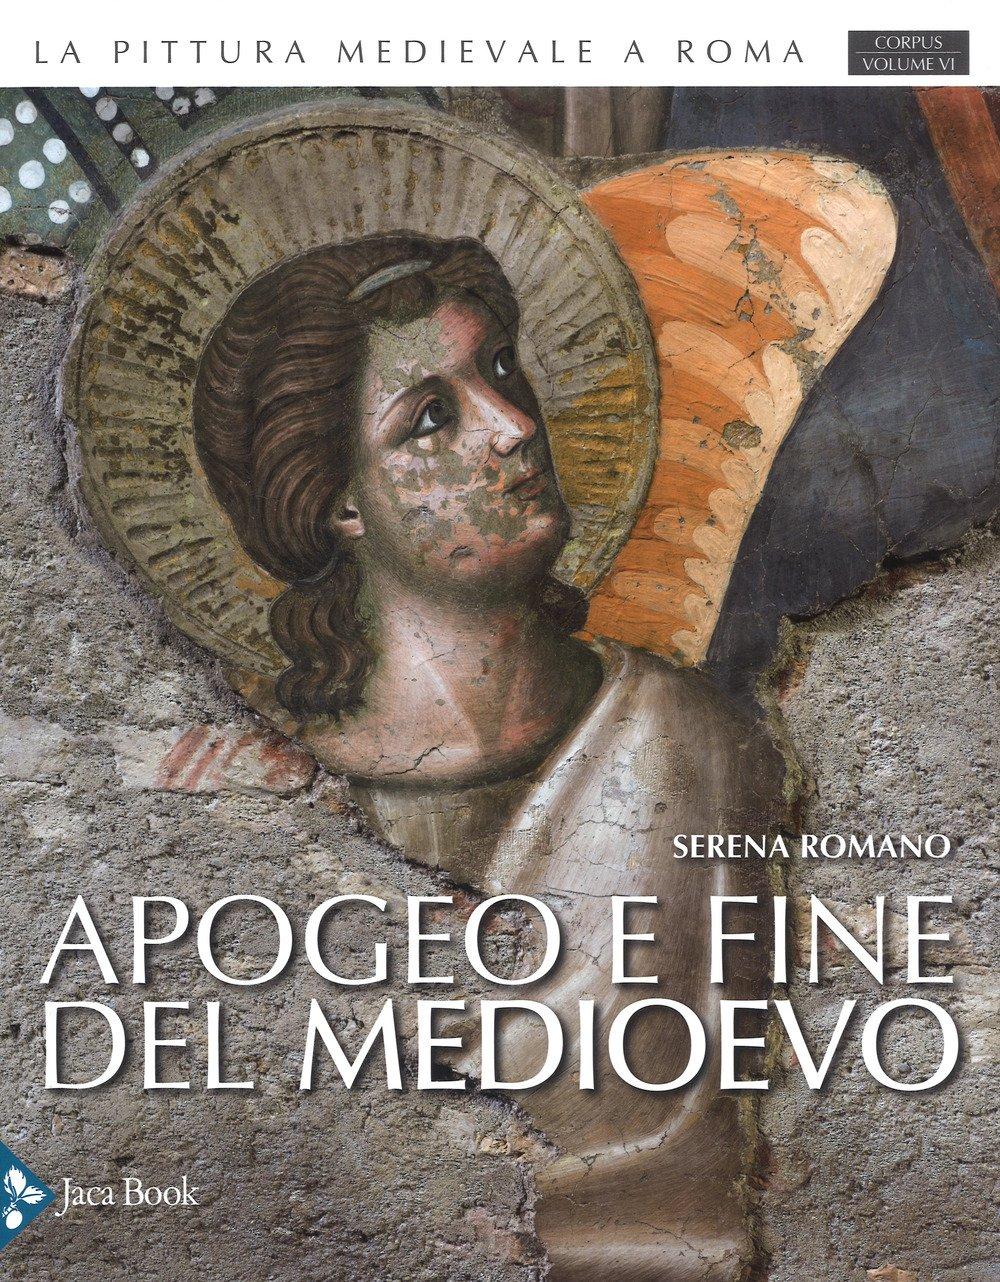 La Pittura Medievale a Roma. Corpus VI.